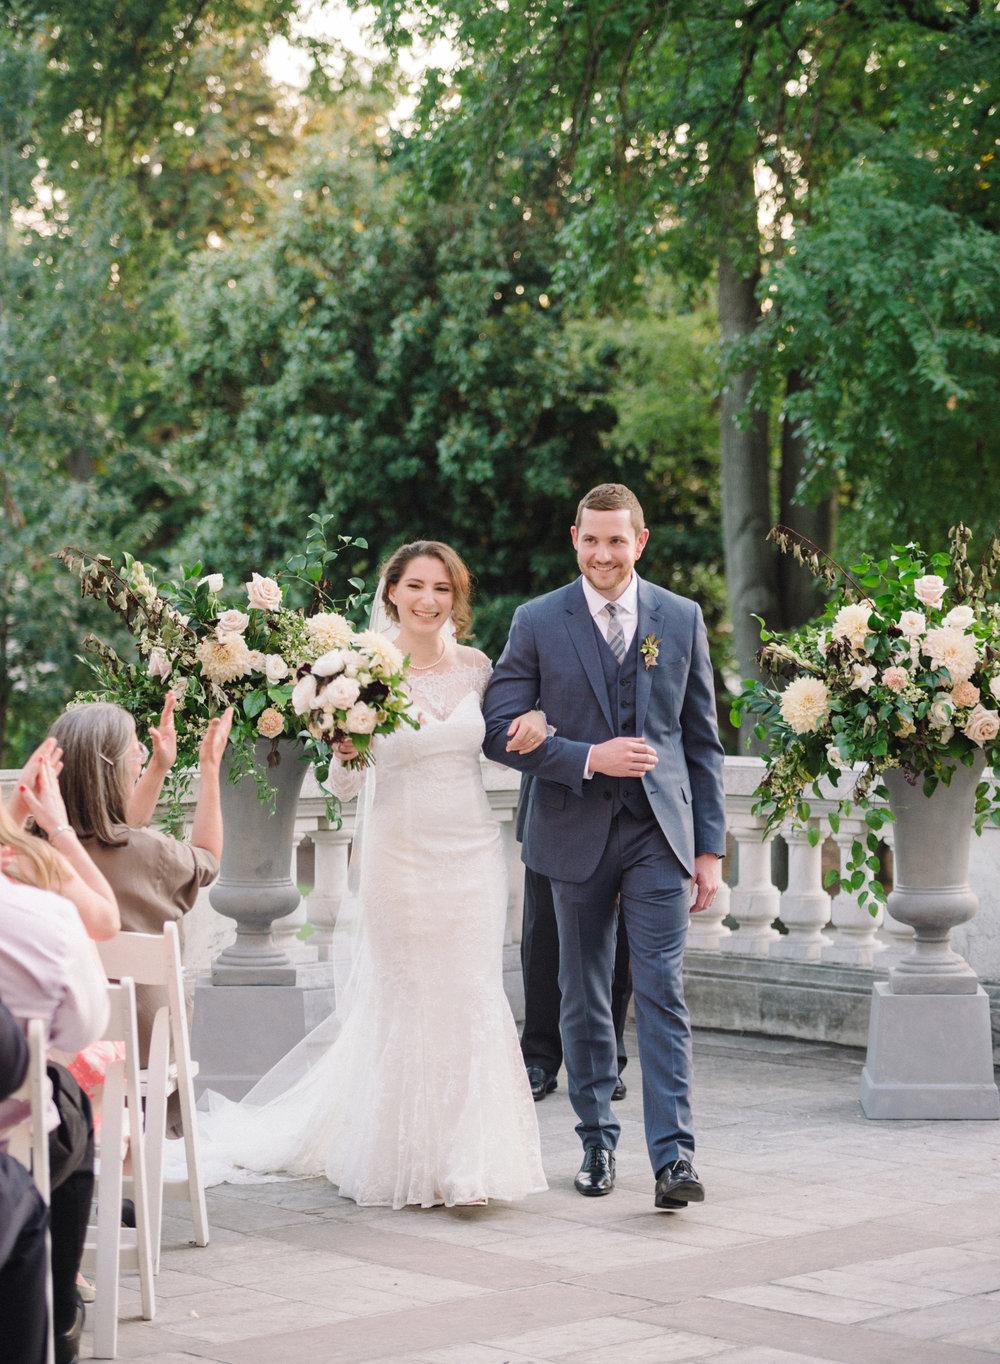 DAR Wedding Flowers by Wild Green Yonder